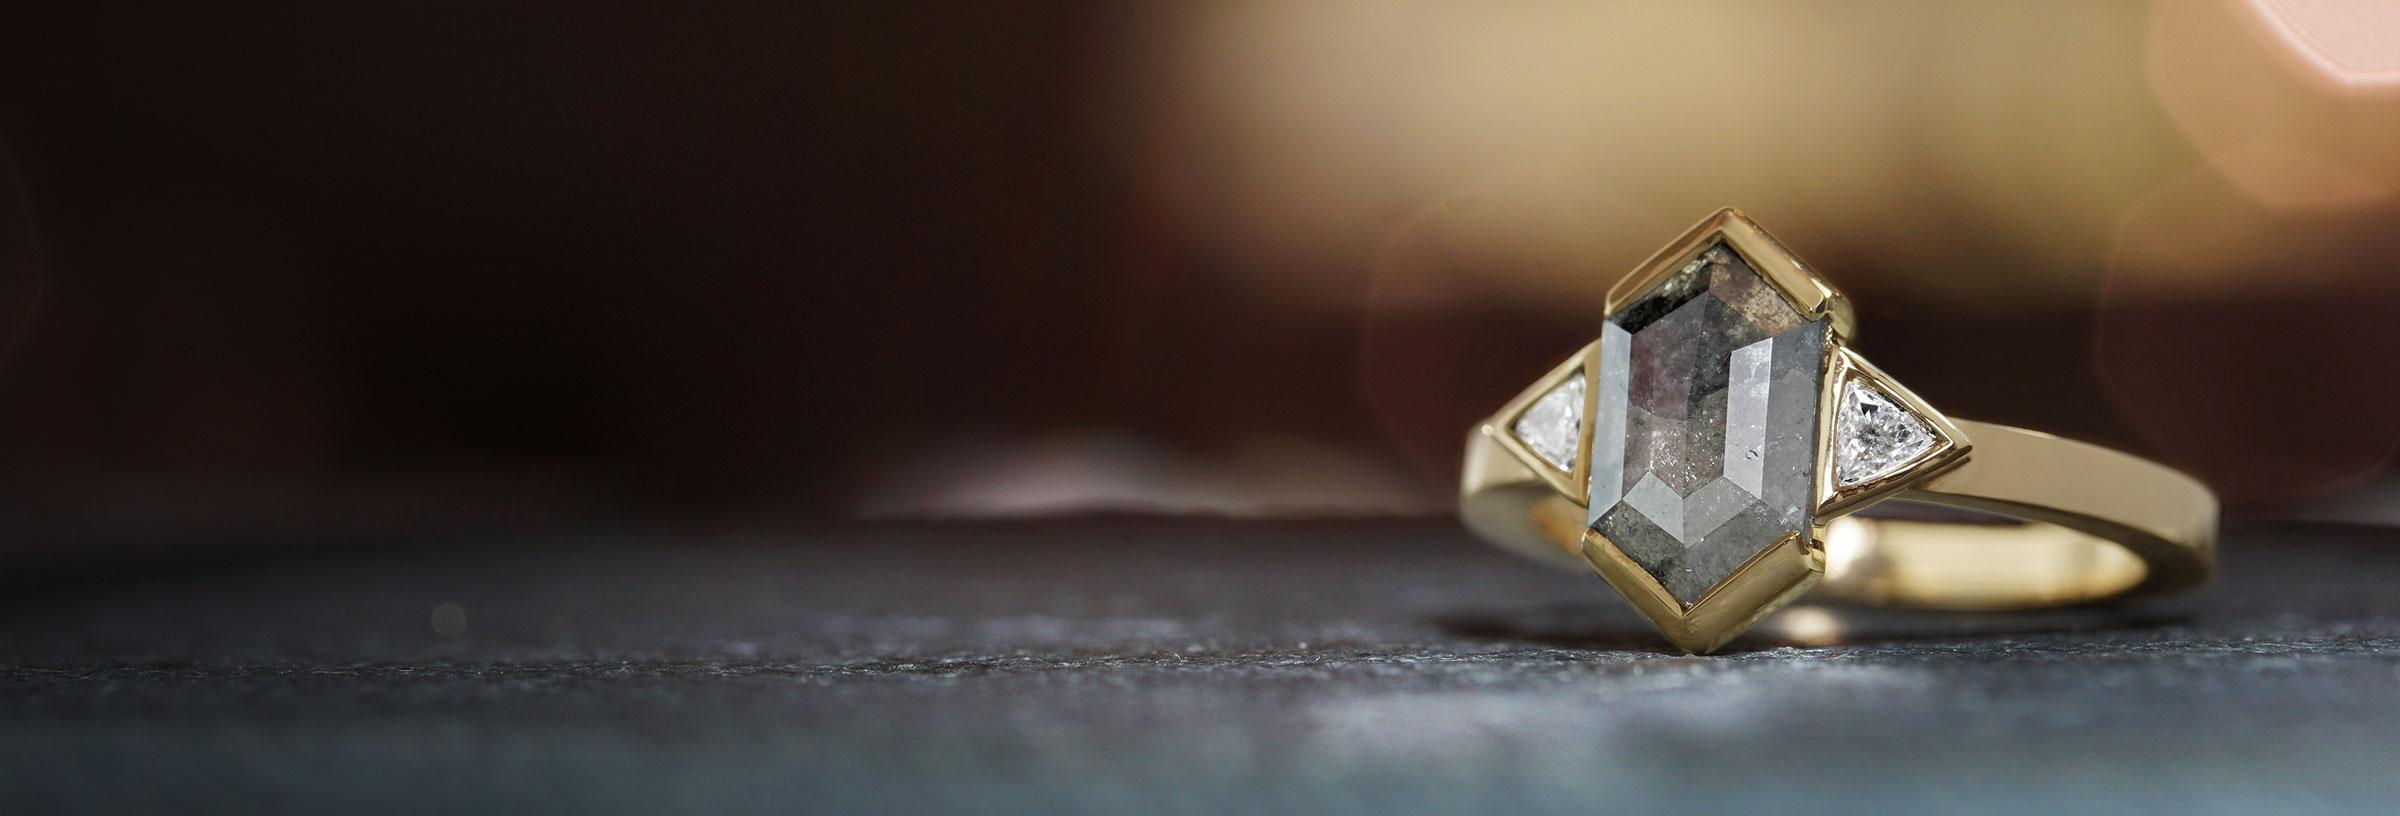 yellow-gold-and-hexagonal-salt-and-pepper-geometric-diamond-engagement-ring